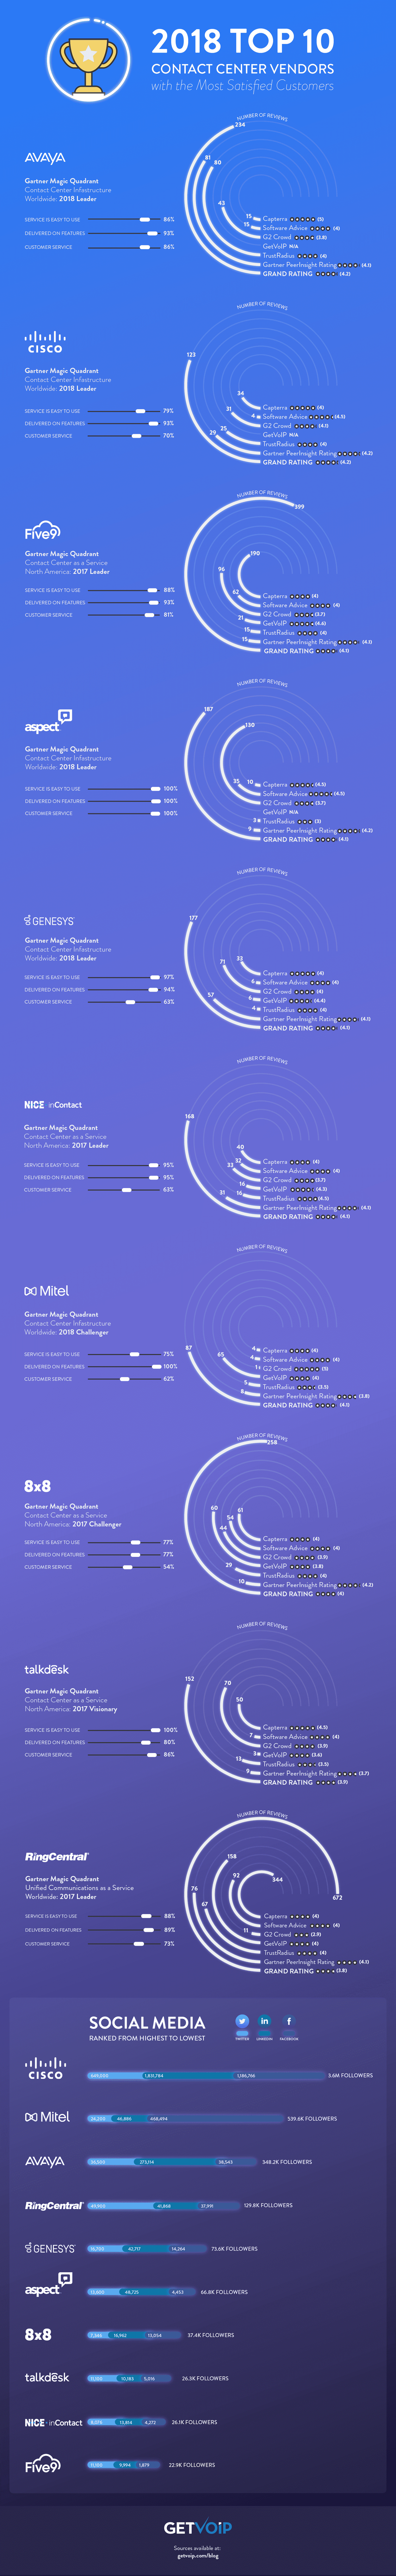 Contact Center Vendors 2018 Graphic